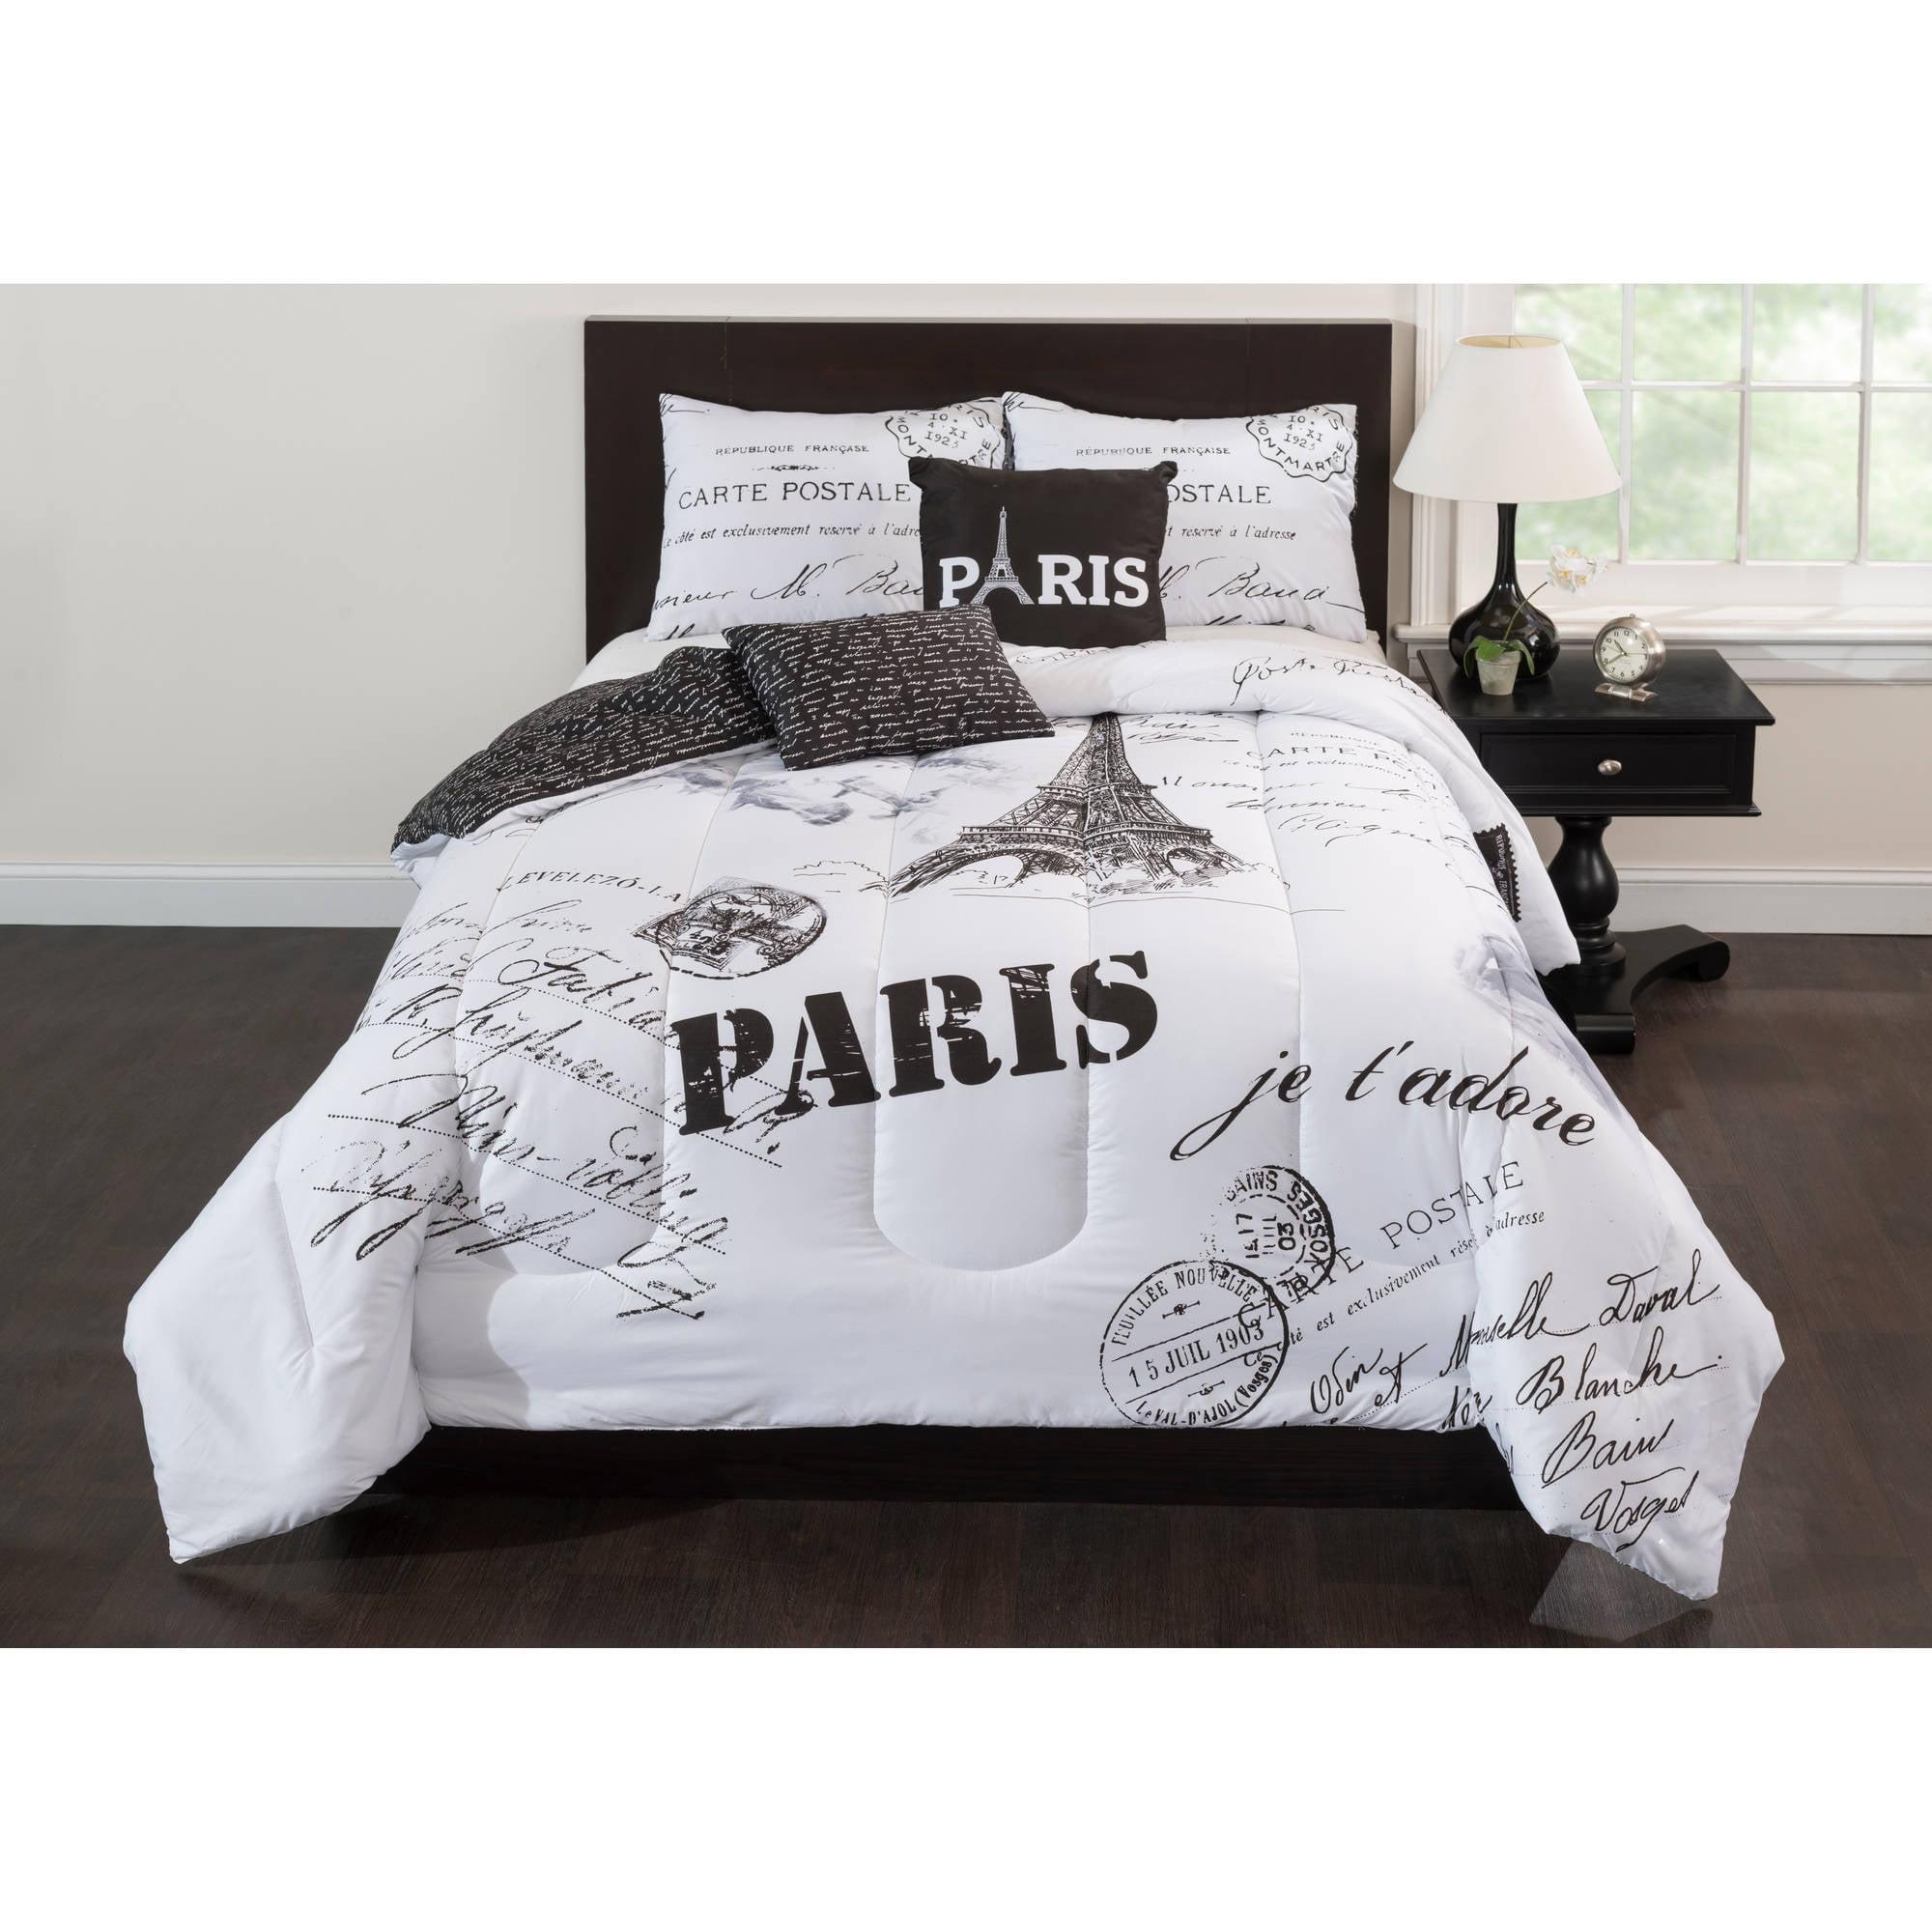 Casa J'Adore 5-Piece Bedding Comforter Set